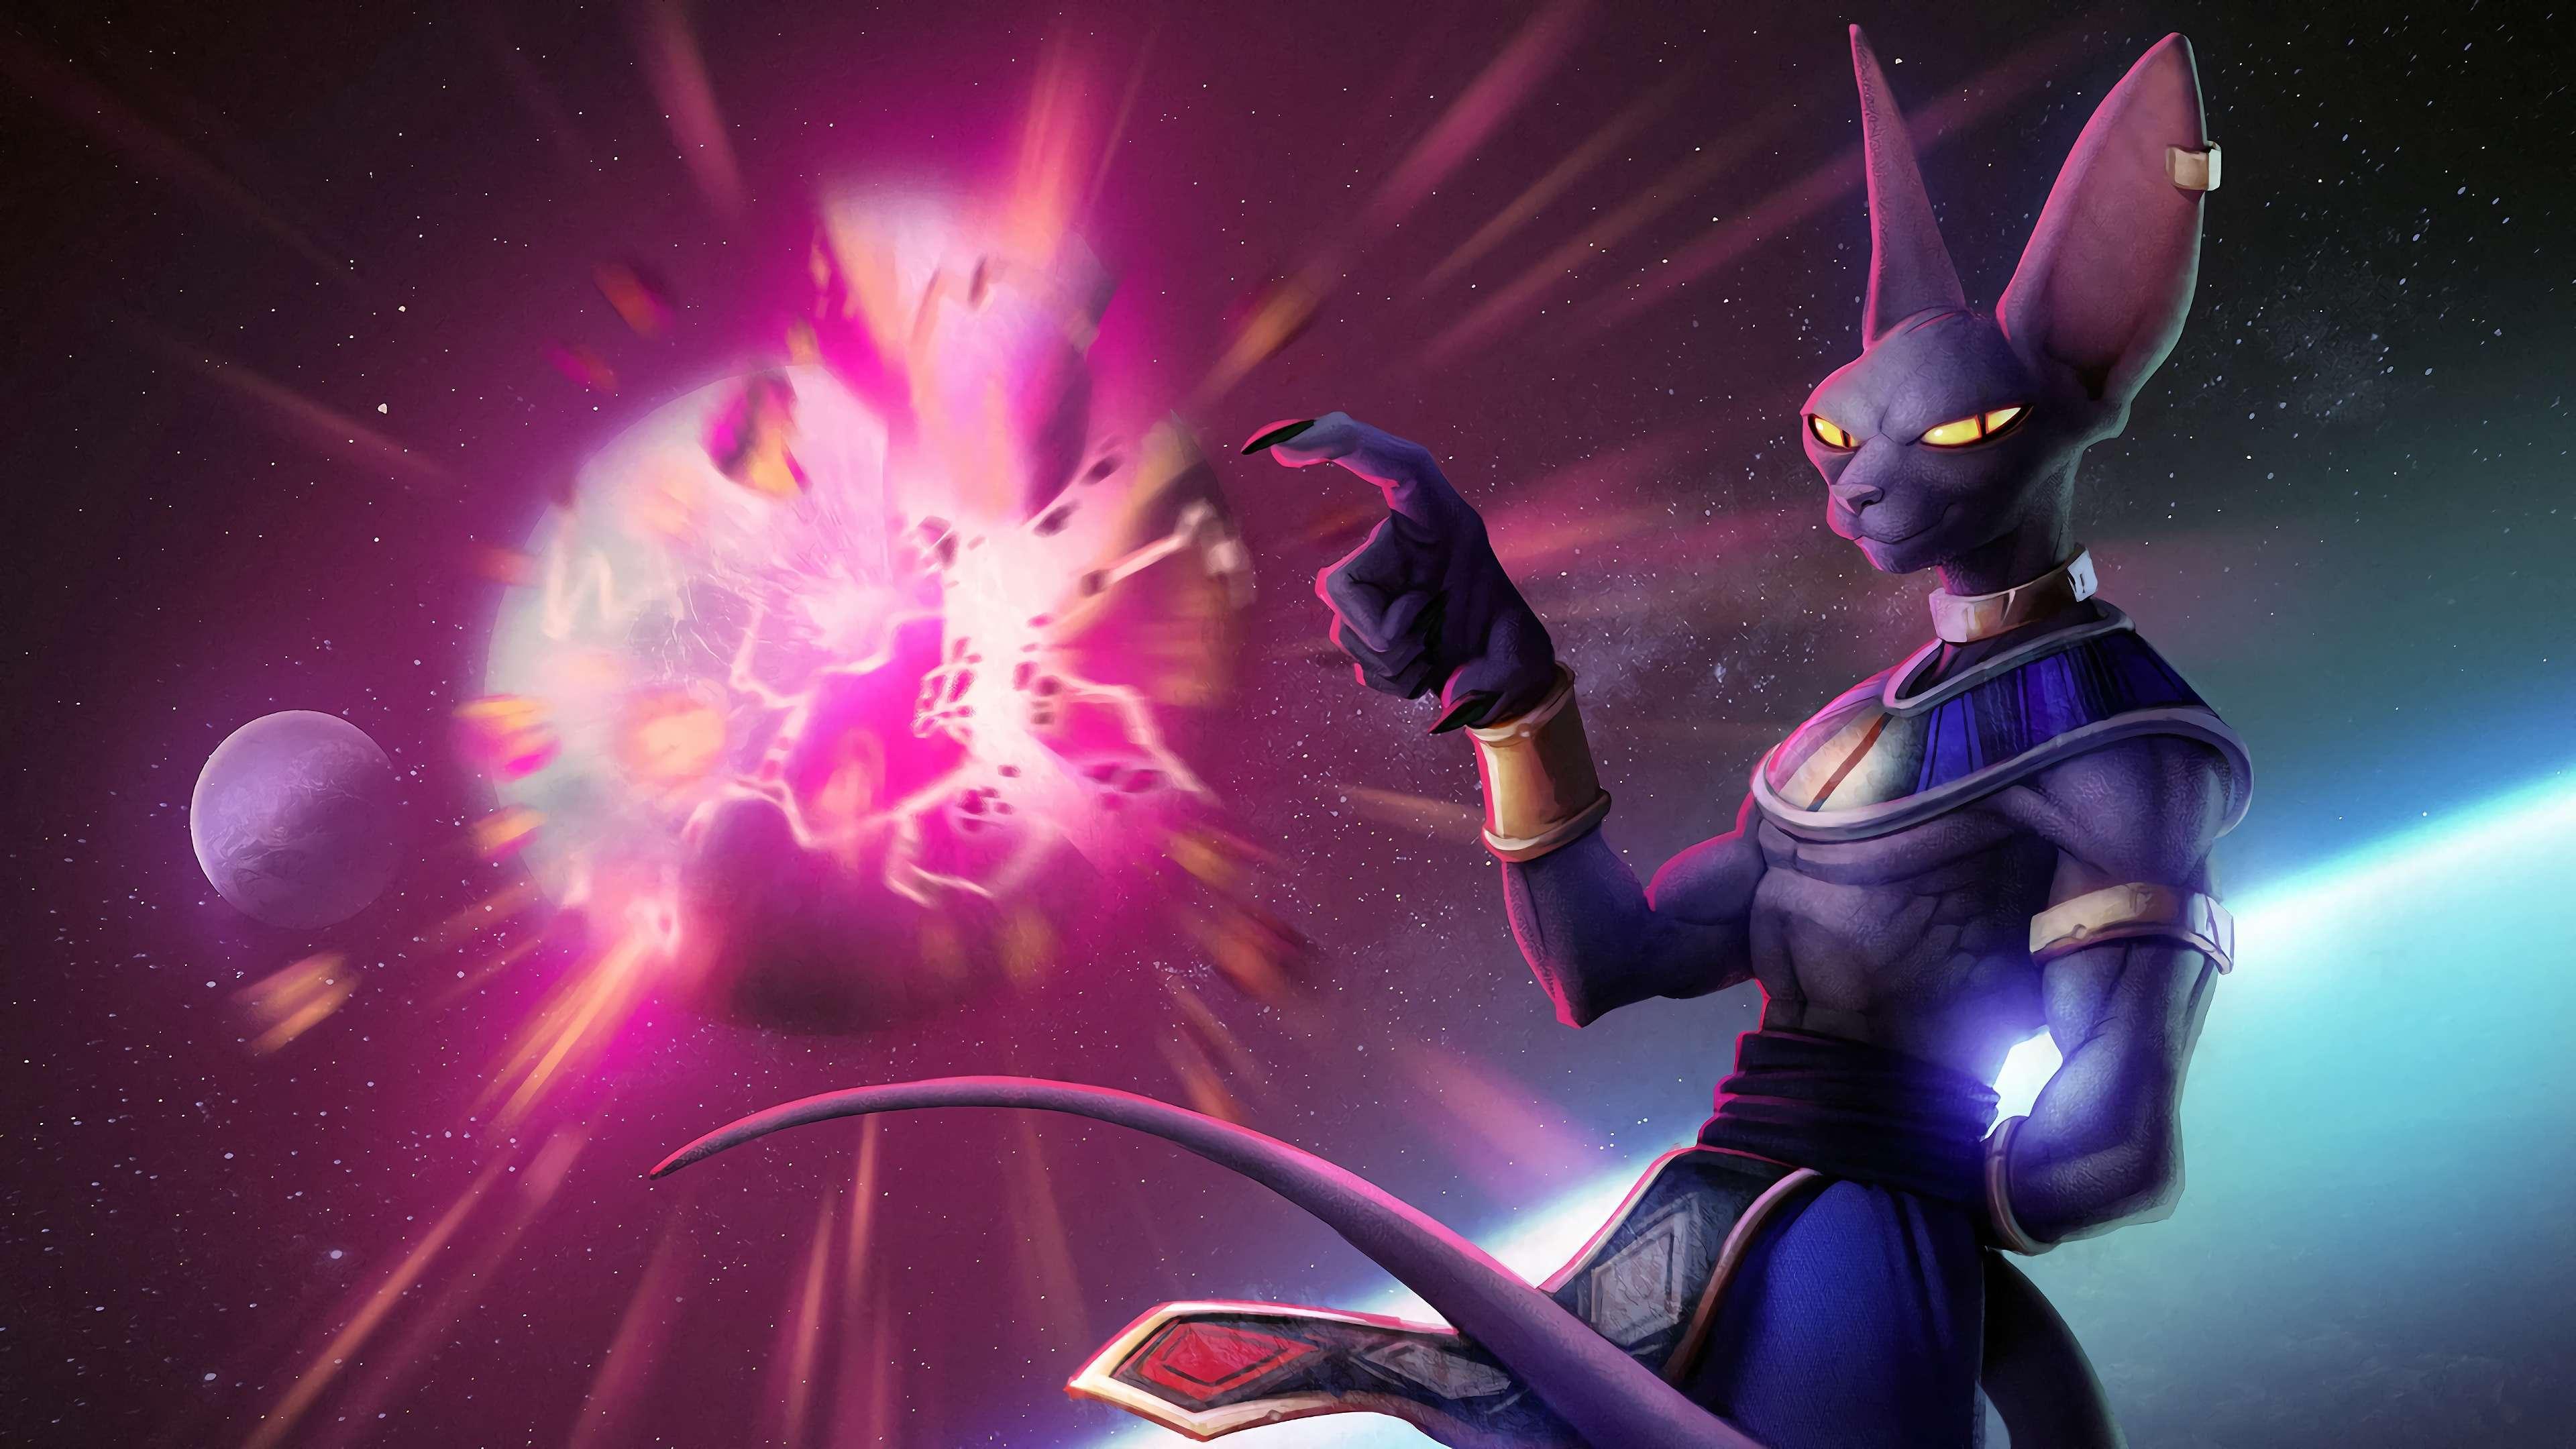 wp-content/uploads/2018/08/beerus-god-of-destruction-dragon-ball-super-a352.jpg